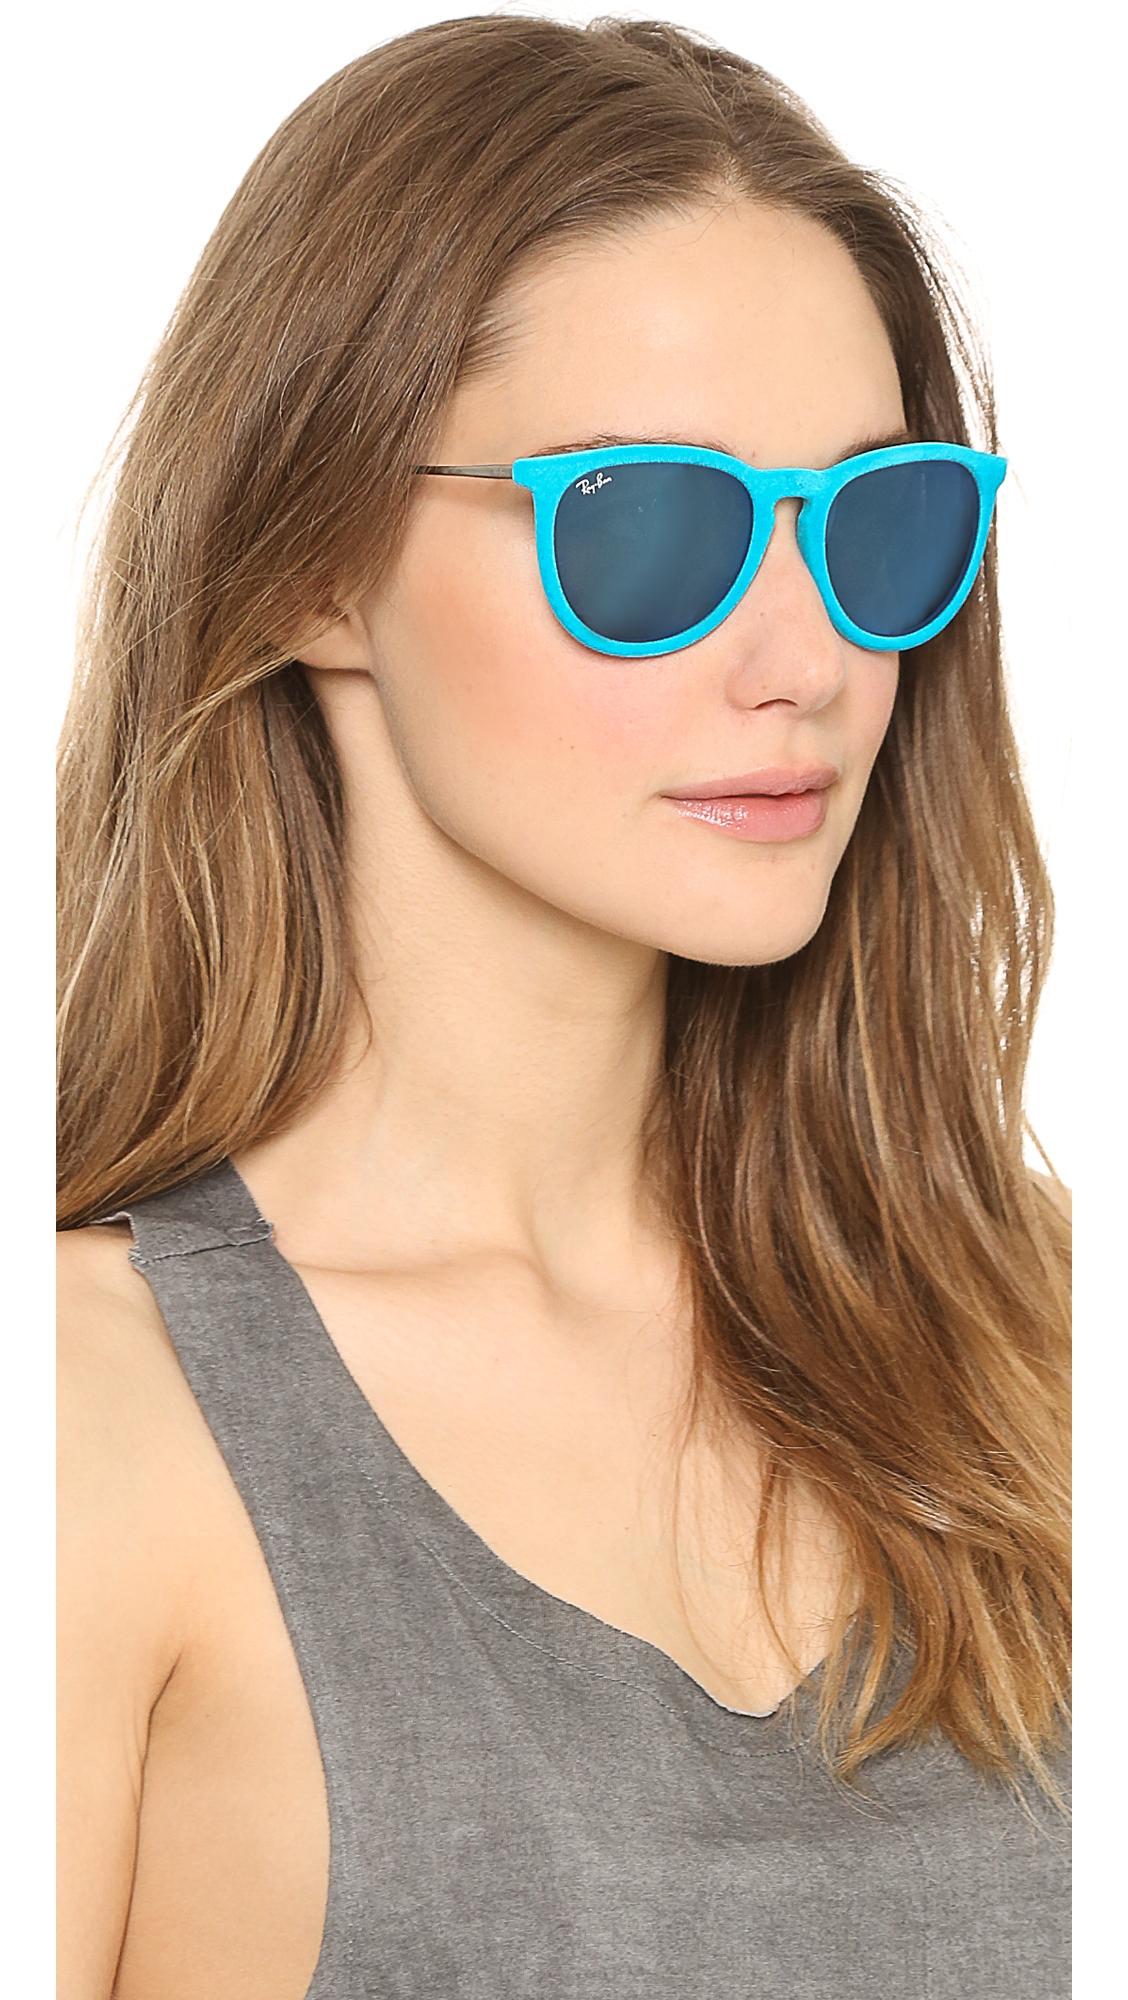 Lyst - Ray-Ban Erika Velvet Sunglasses - Violet in Blue 10cc376c9